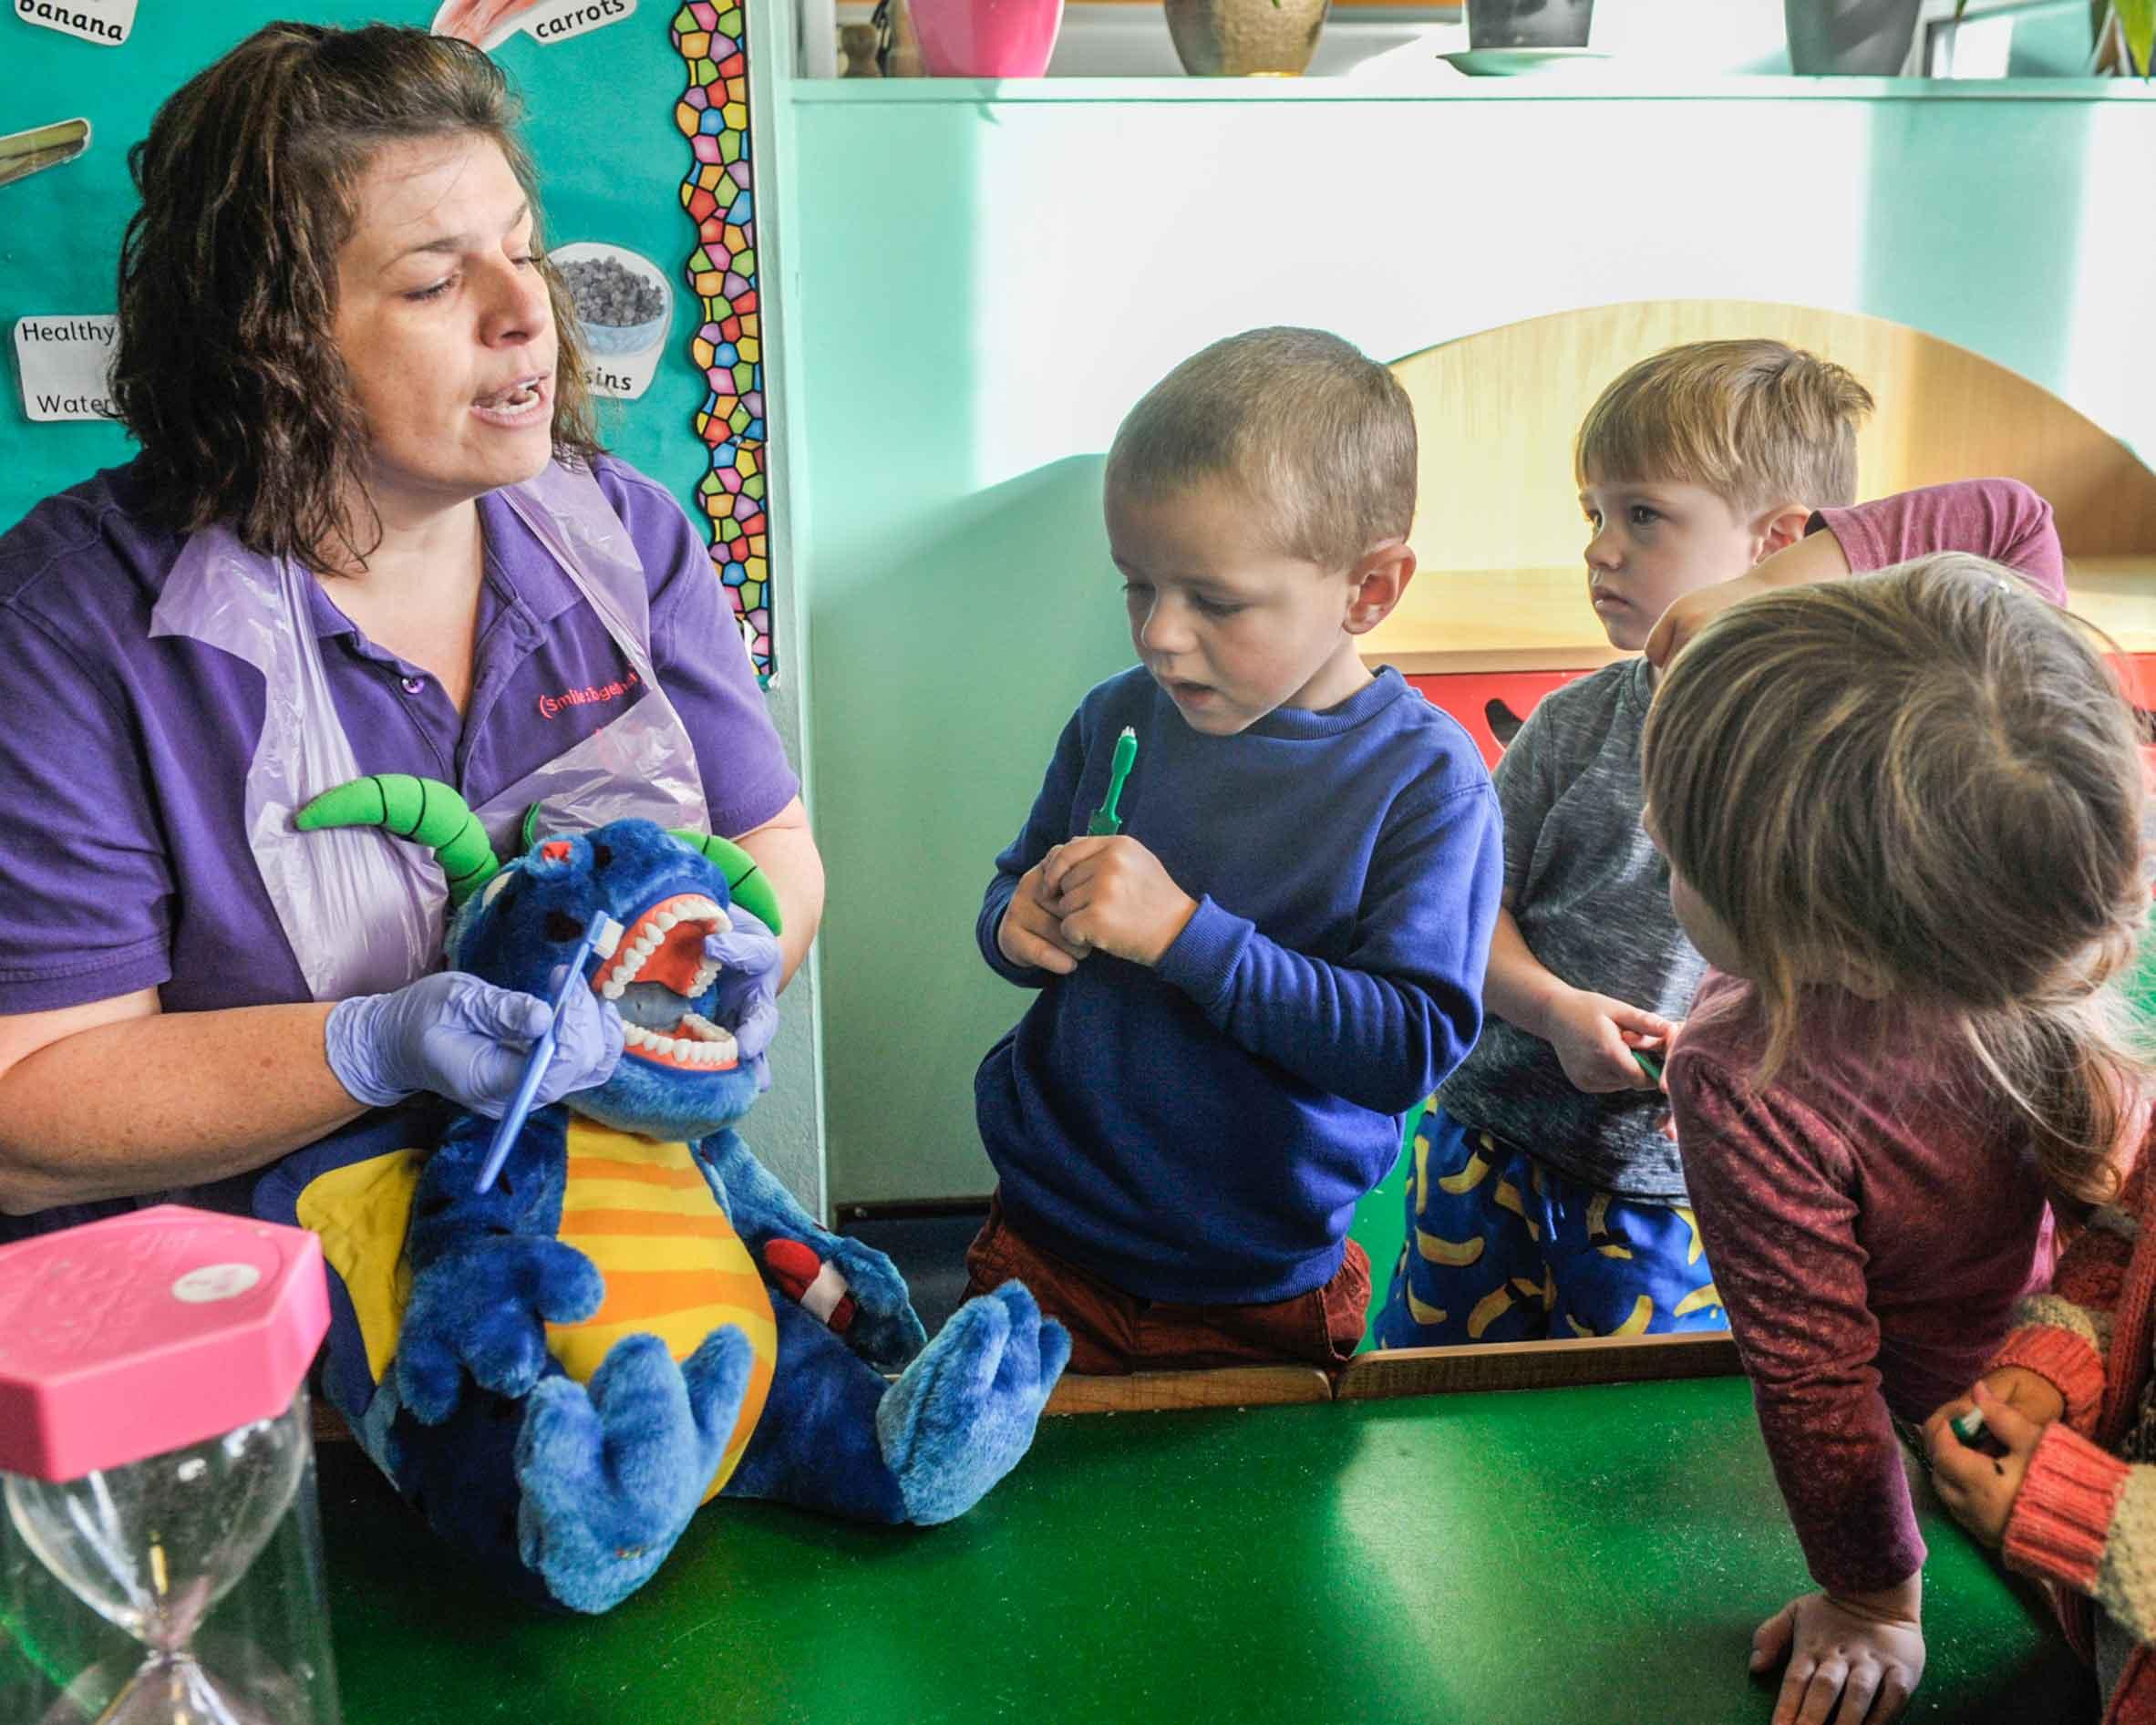 Brighter Smiles dental nurse showing children how to brush dragon's teeth